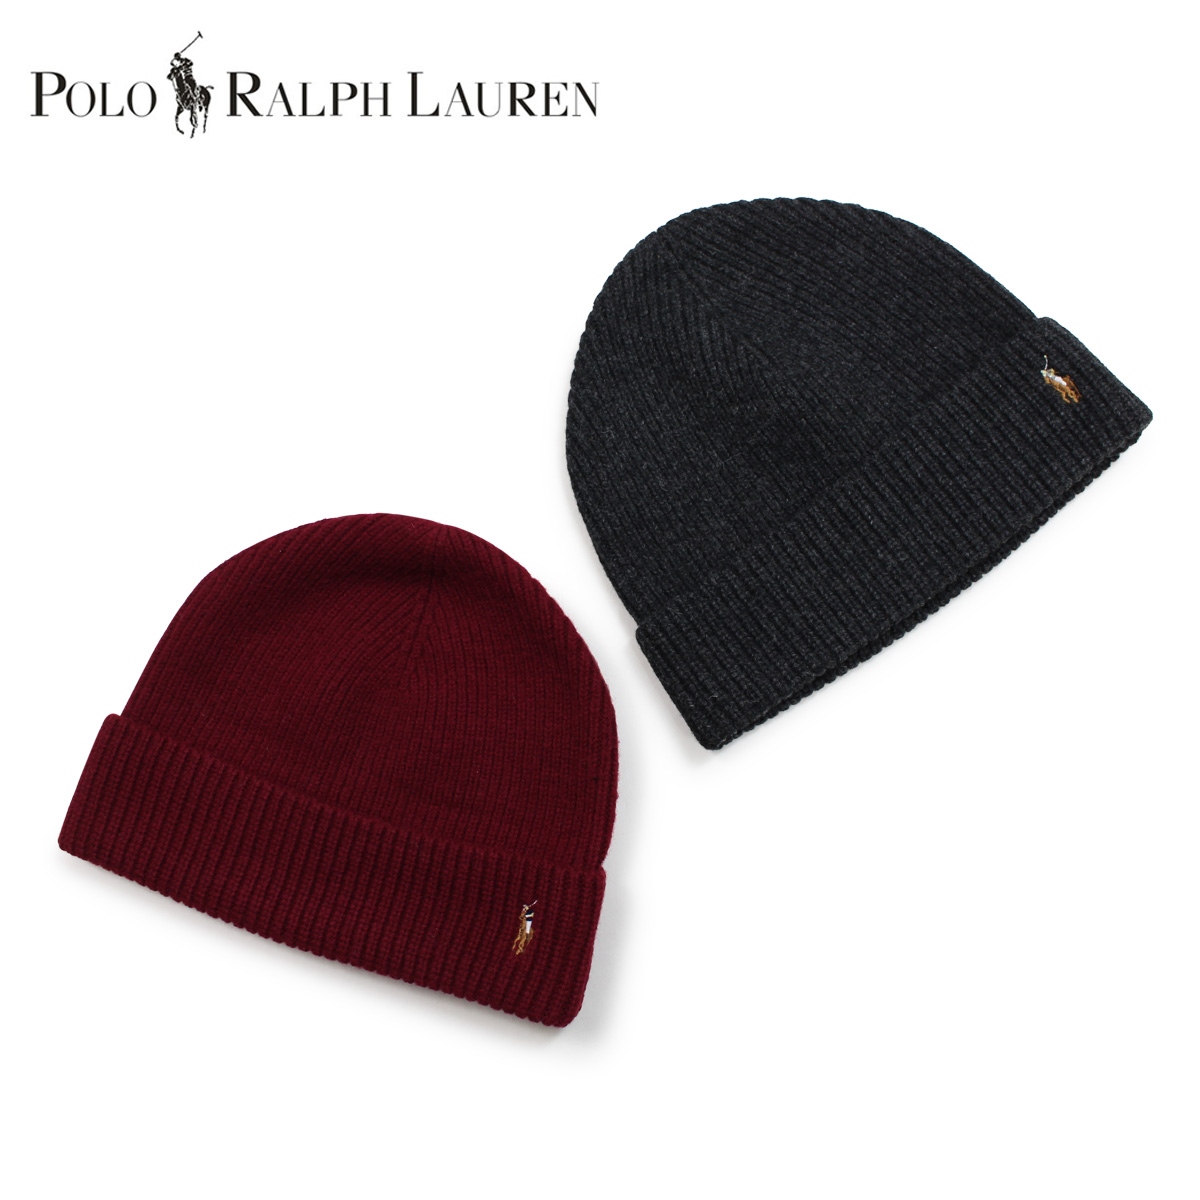 532985c06c0 POLO RALPH LAUREN polo Ralph Lauren knit hat knit cap beanie men gap Dis  merino wool MERINO WOOL WATCH CAP charcoal Bordeaux 6F0101  1 15 Shinnyu  load